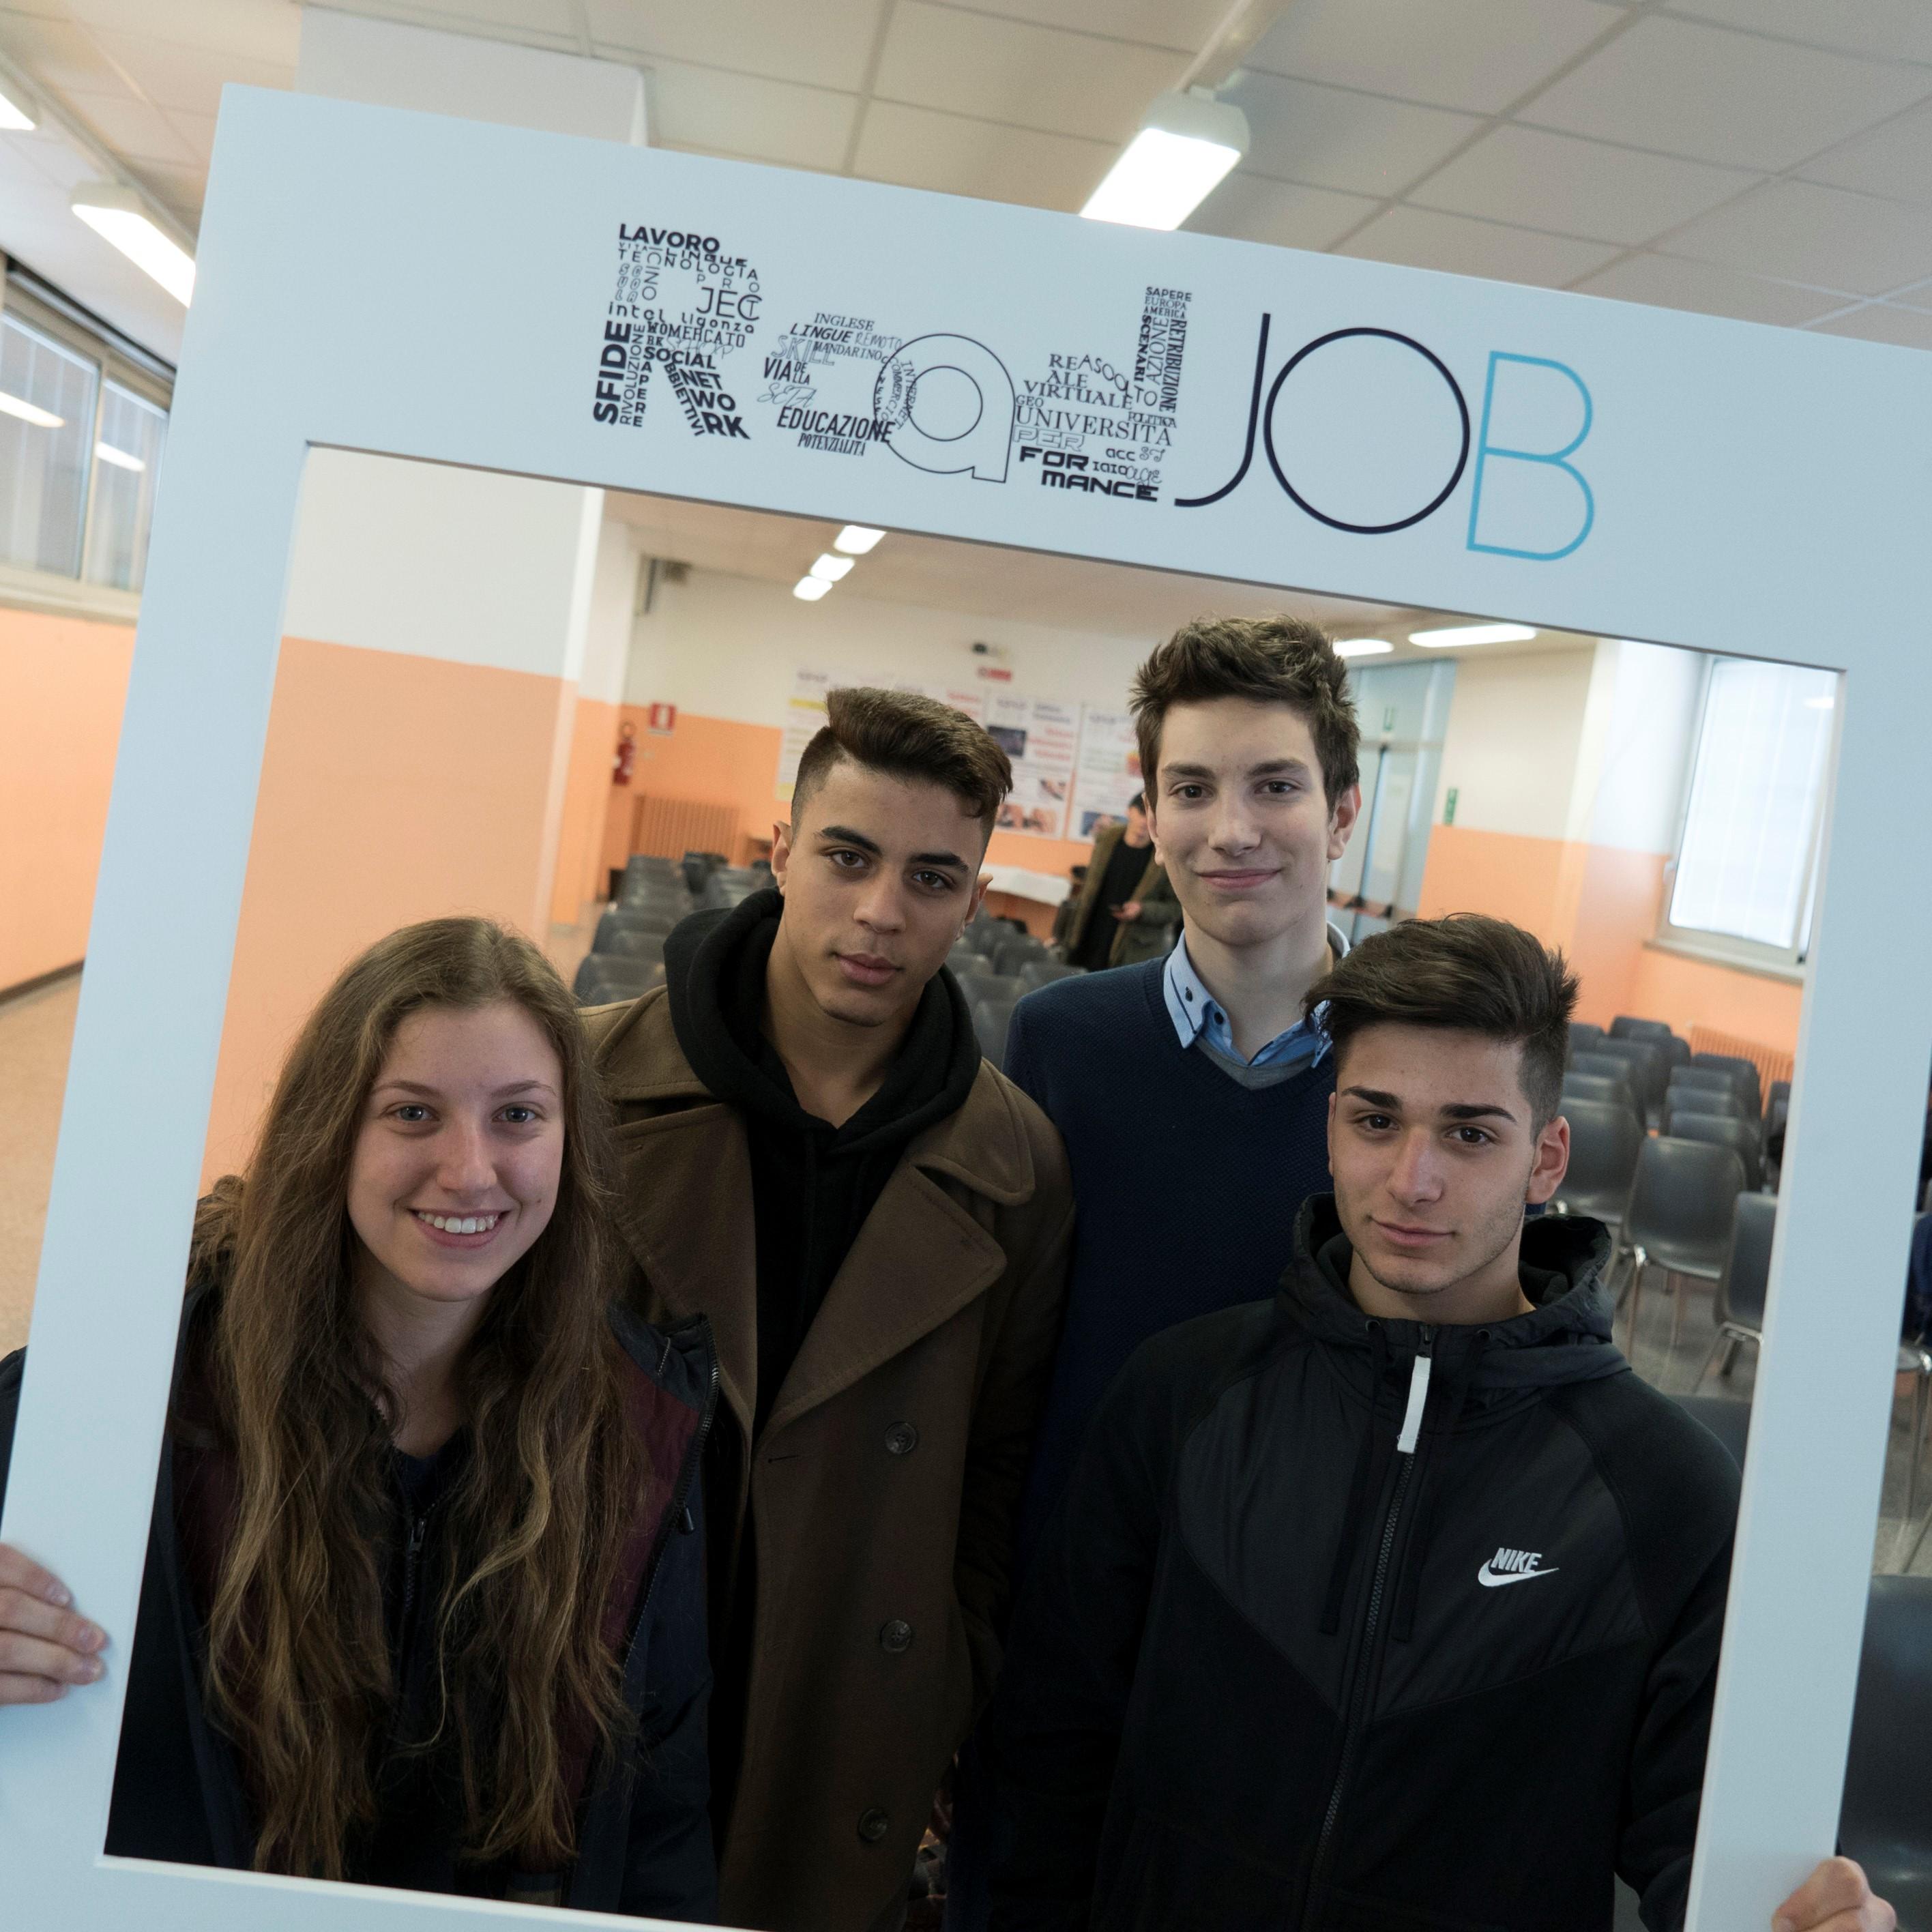 roadjob-foto-26.02.19_61-2